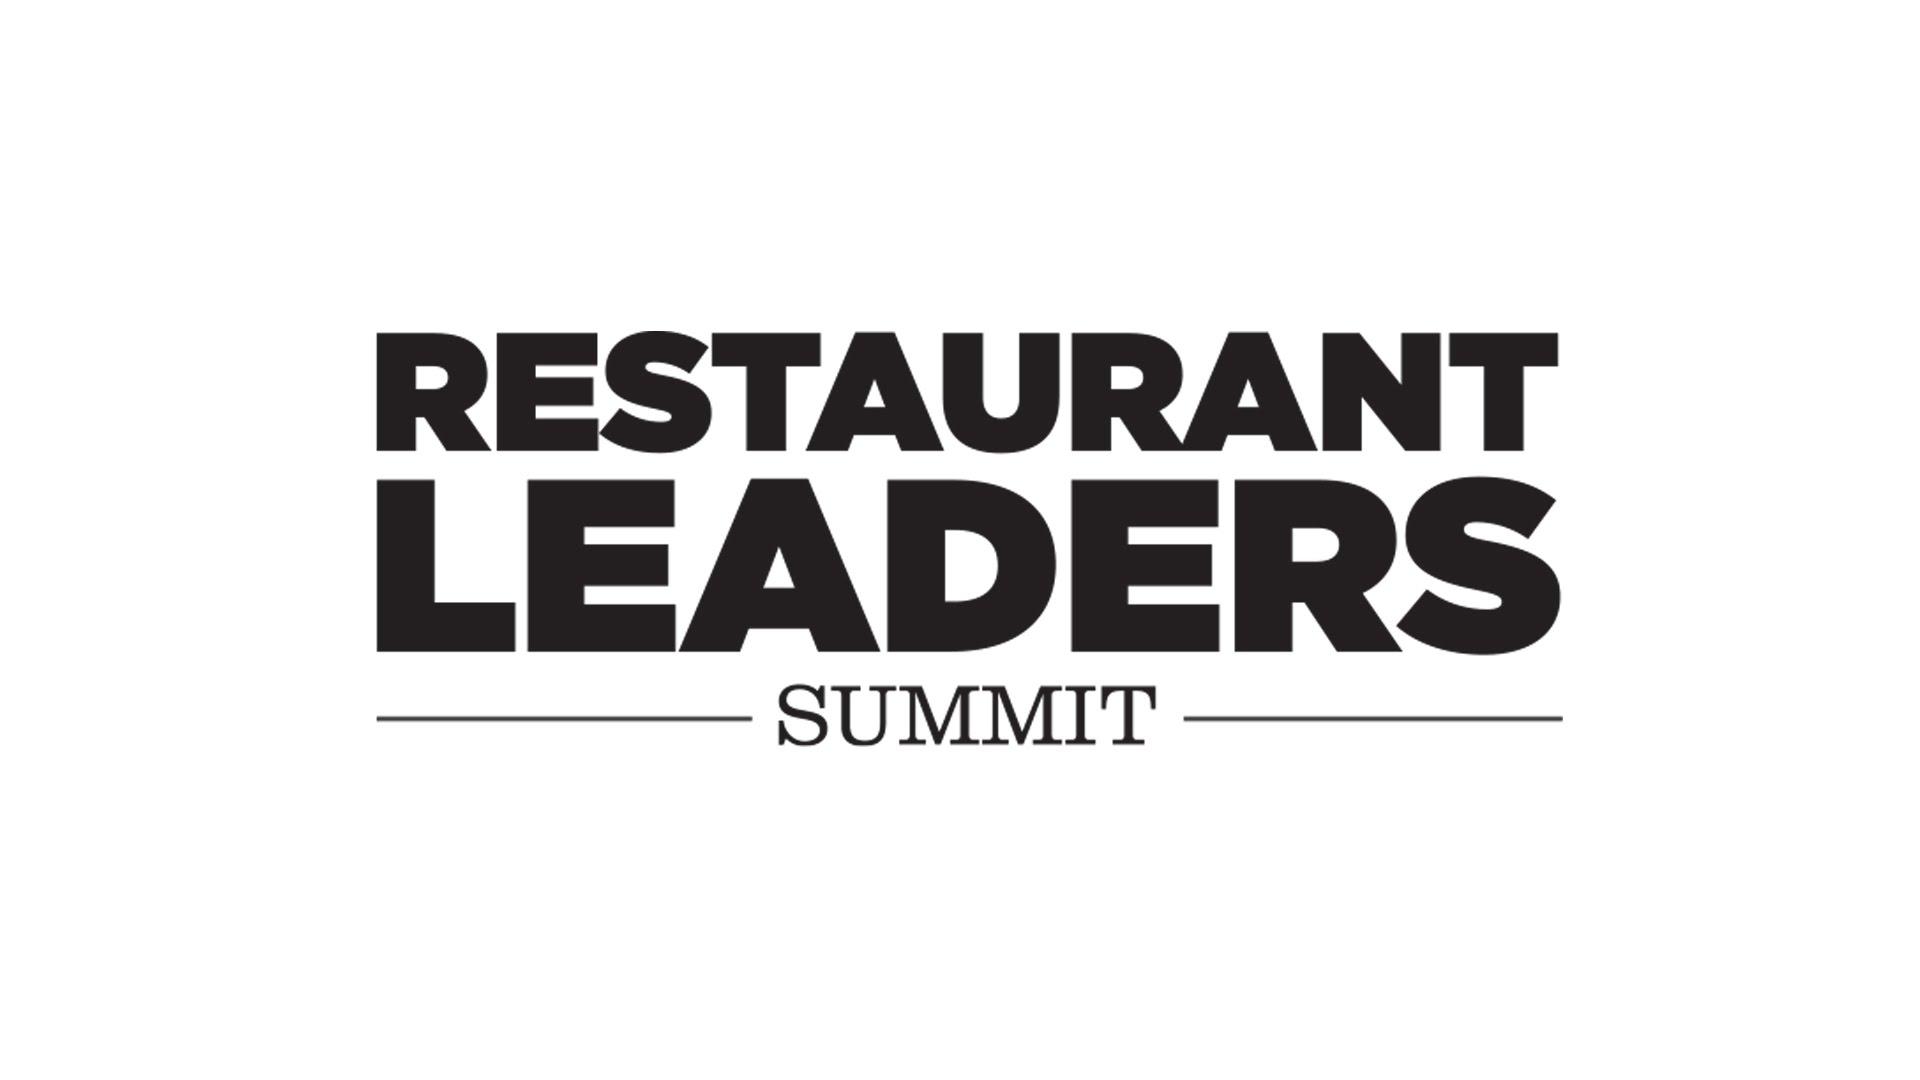 restaurant leaders summit-3.jpg